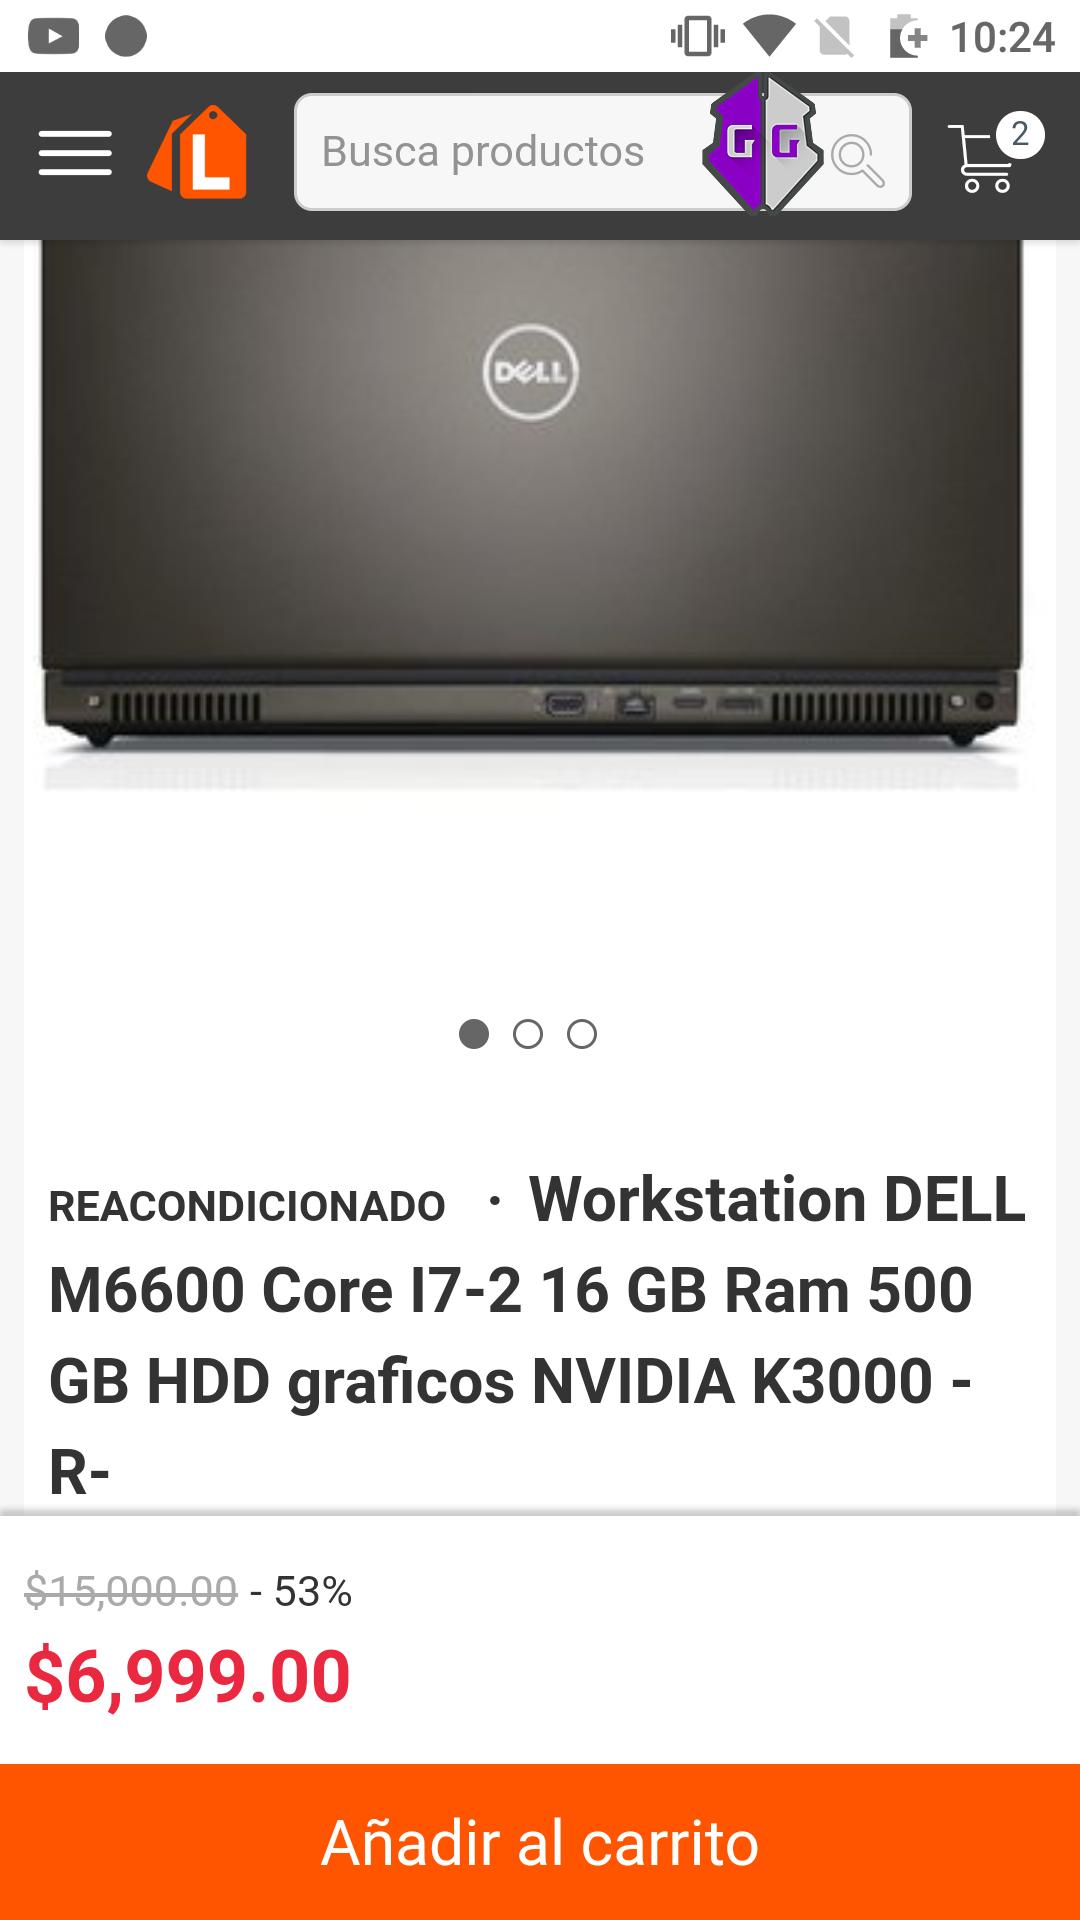 Linio: Workstation DELL M6600 Core I7-2 16 GB Ram 500 GB HDD graficos NVIDIA K3000 -R-